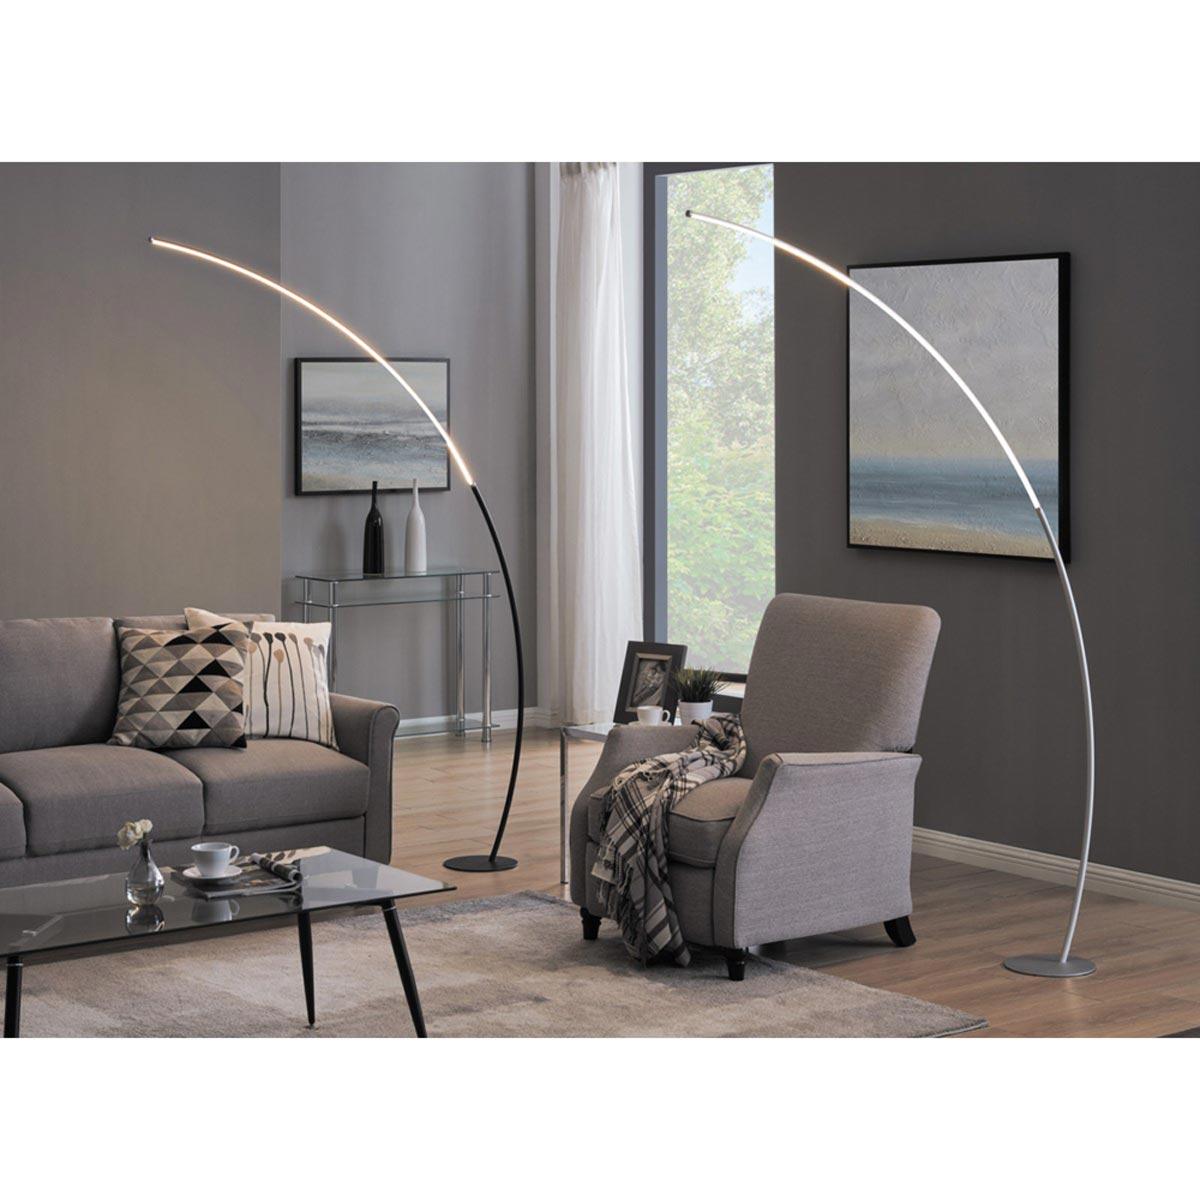 Monita Arc LED Floor Lamp, Silver